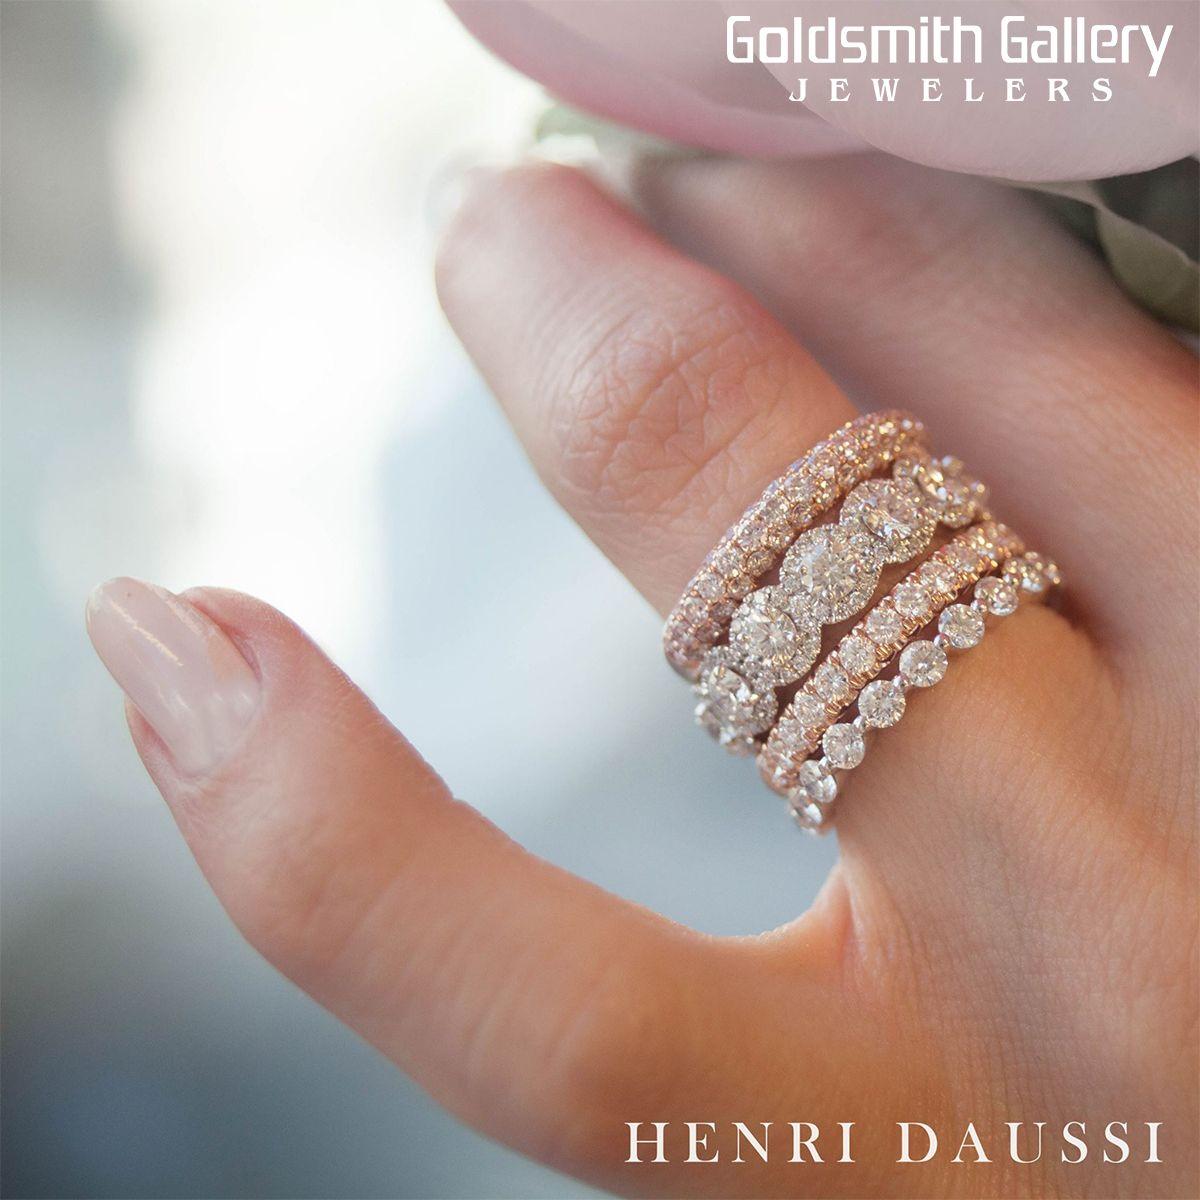 Henri Daussi Engagement Ring And Wedding Band Stack